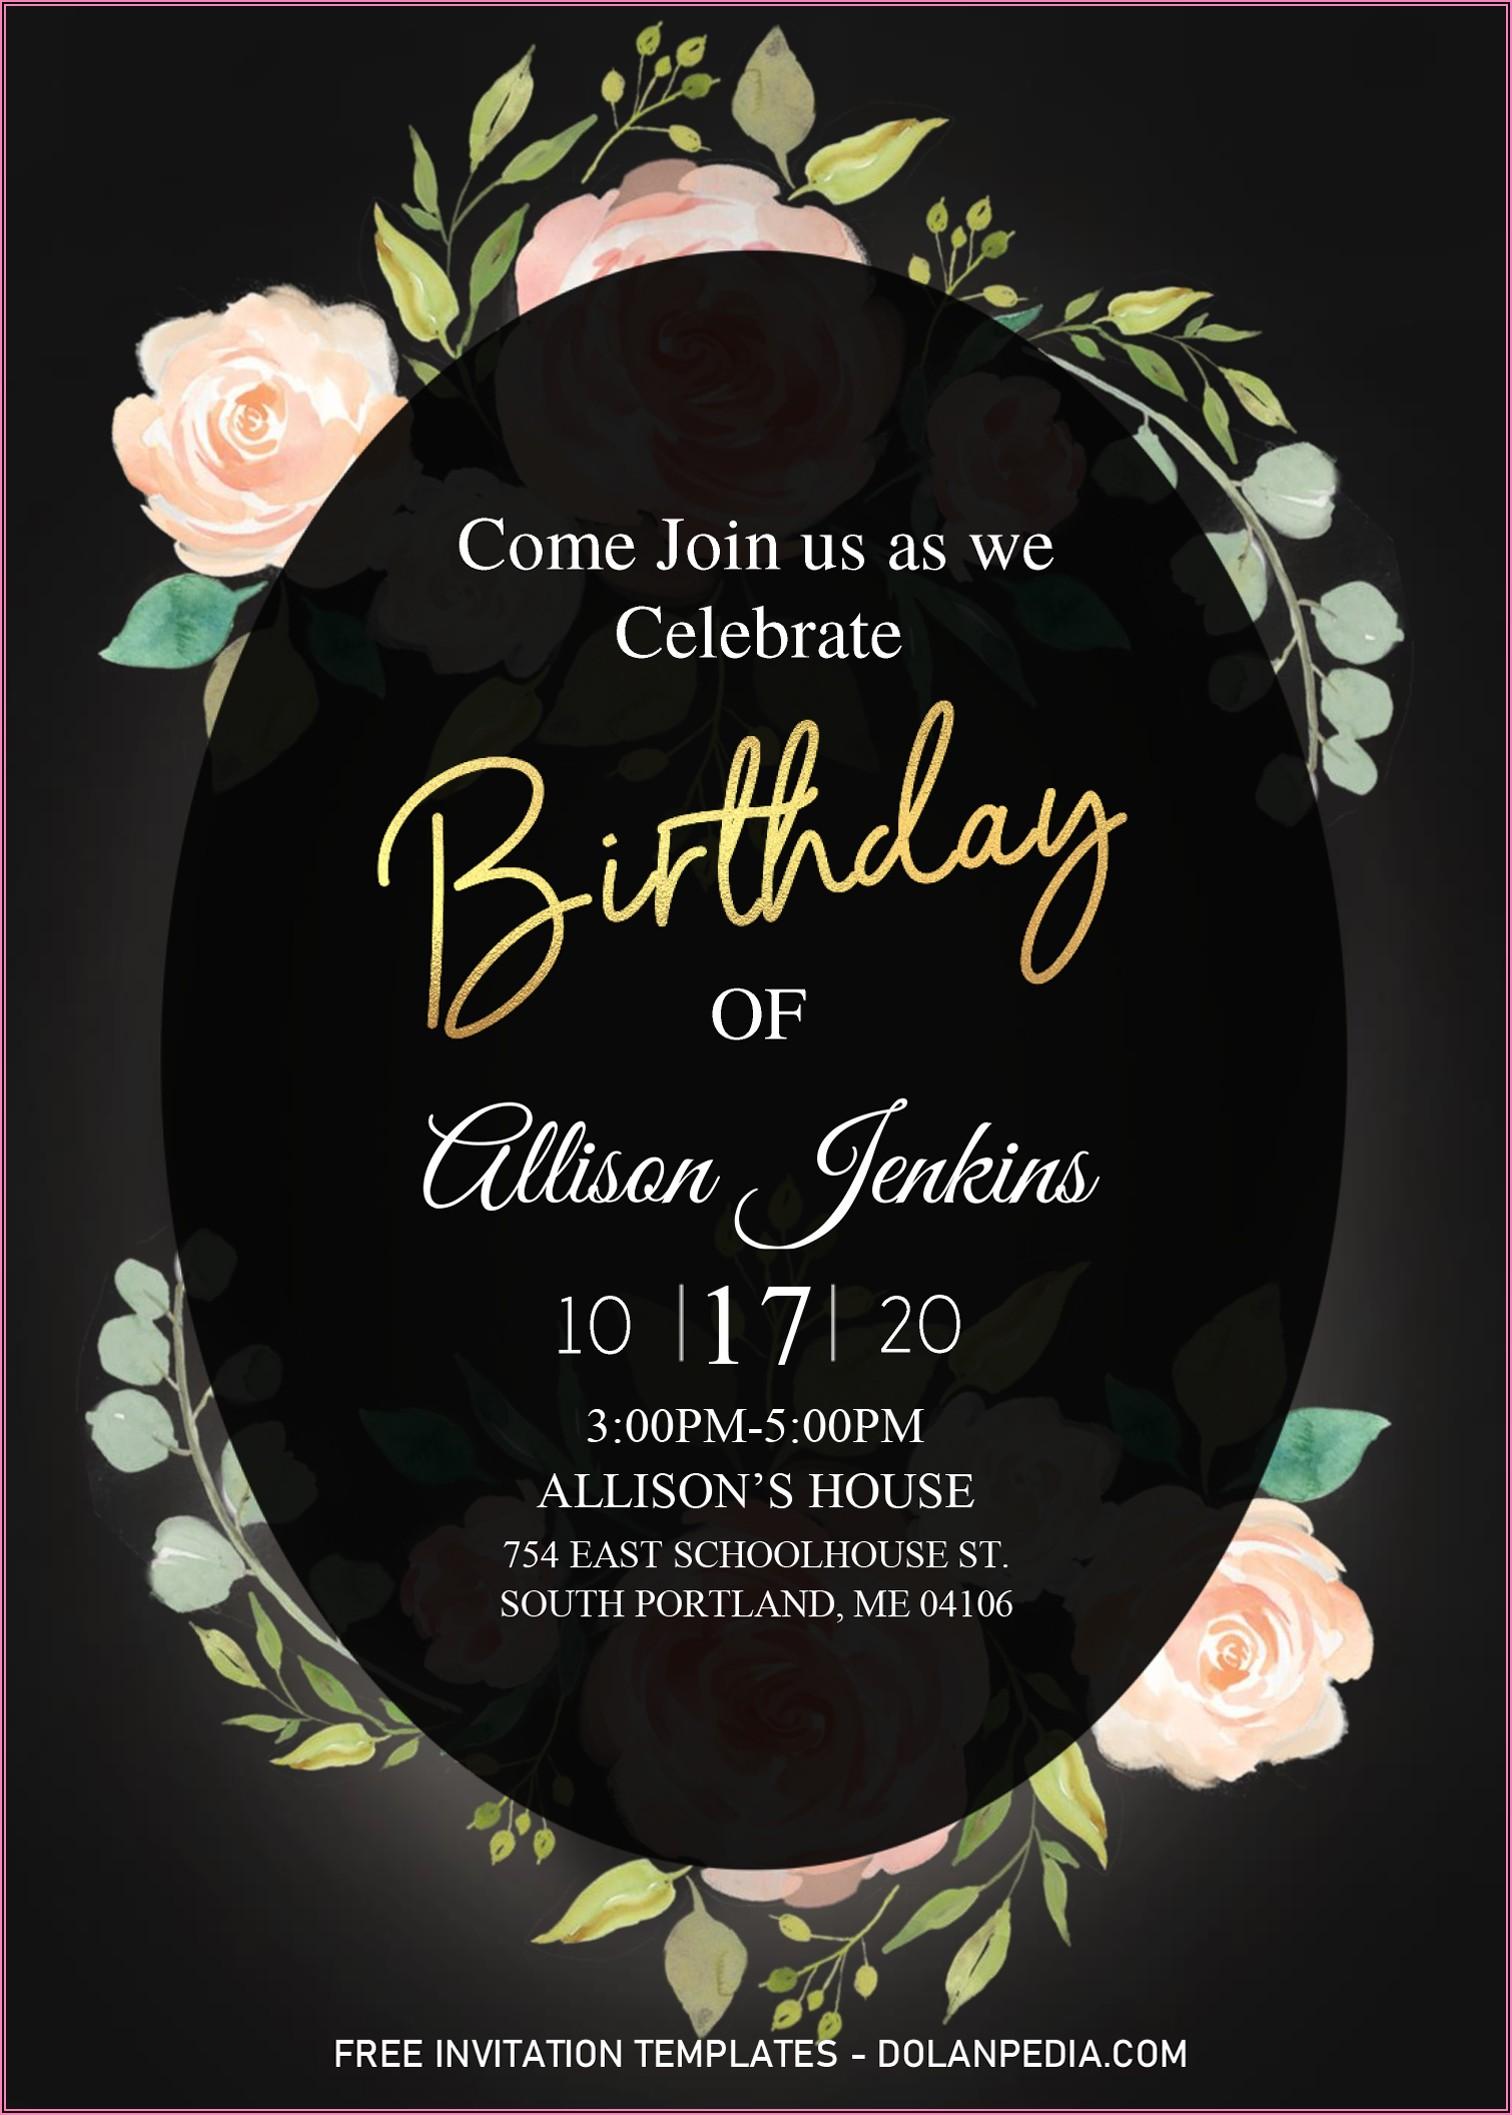 Birthday Invitation Templates Microsoft Word